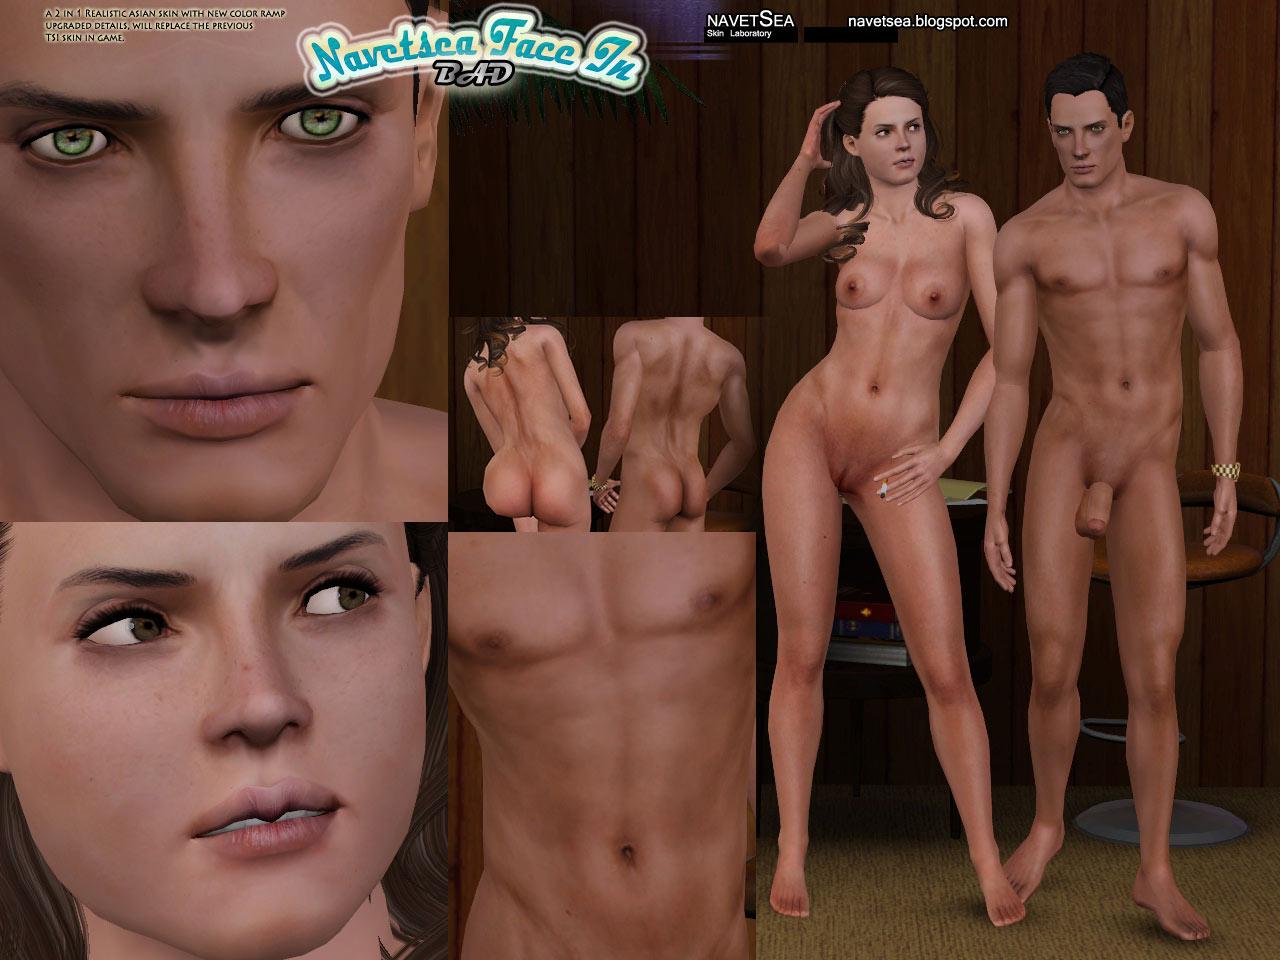 famliy nudist camps